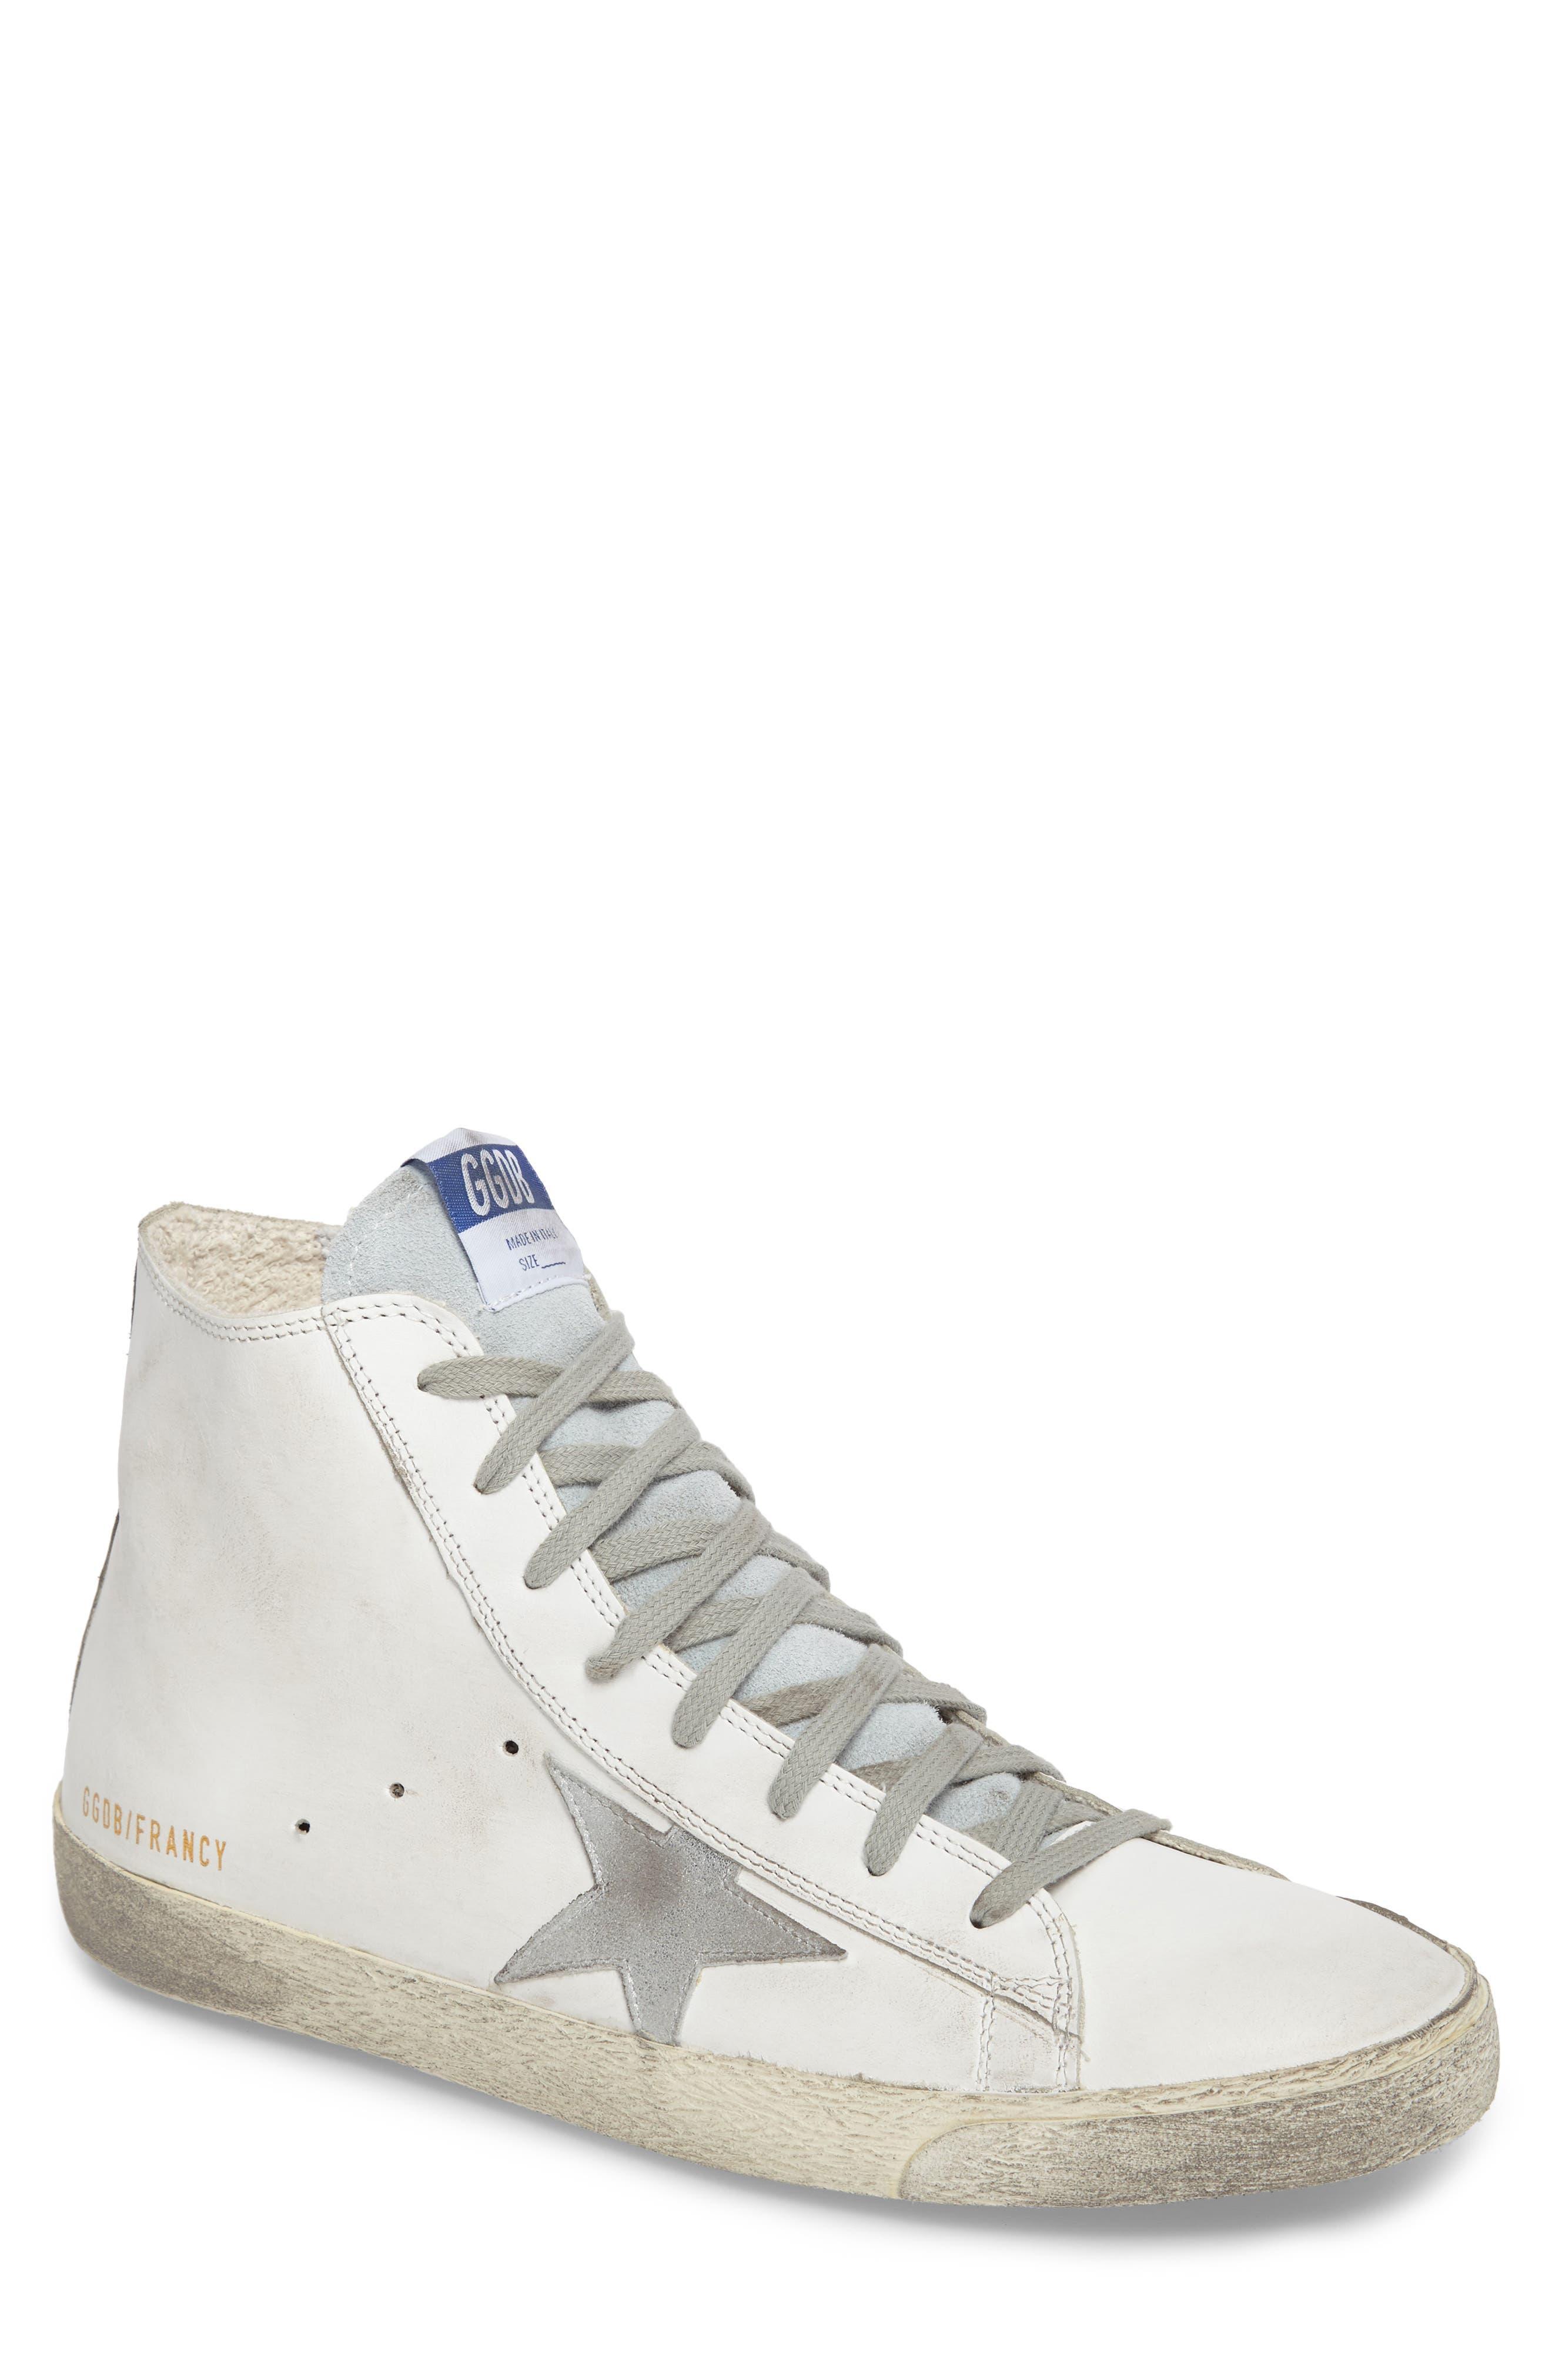 Francy High Top Sneaker,                         Main,                         color, 100